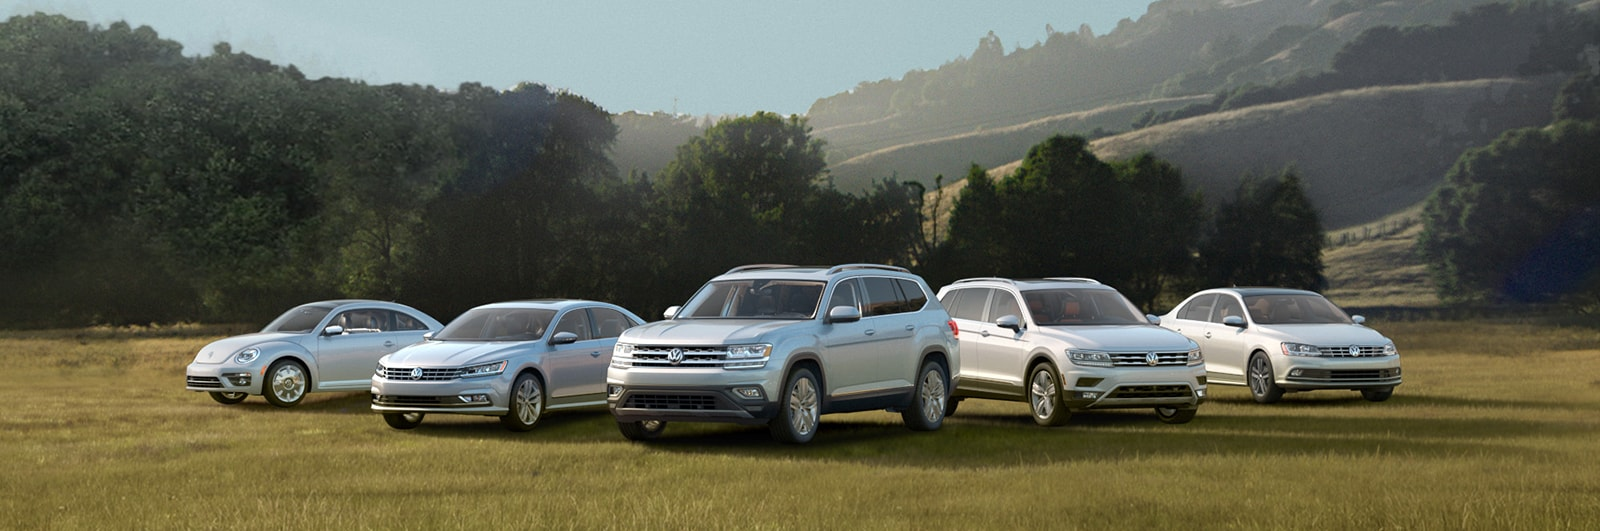 Volkswagen Atlanta Atlanta Vw Dealership New Used Cars